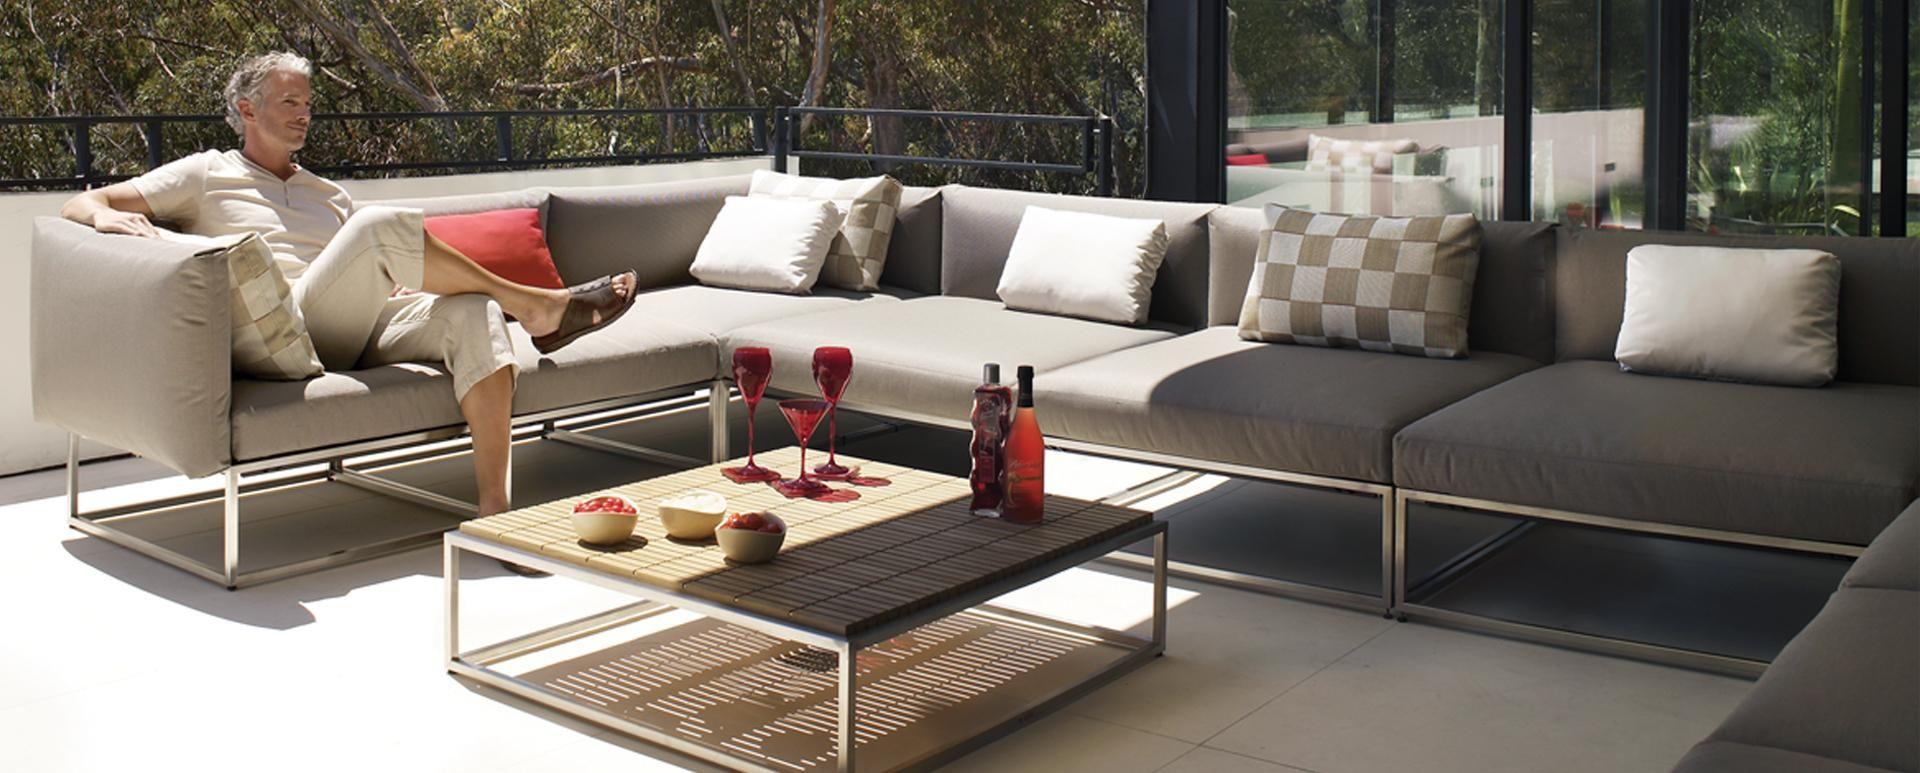 Exterior Furniture | Gloster Furniture